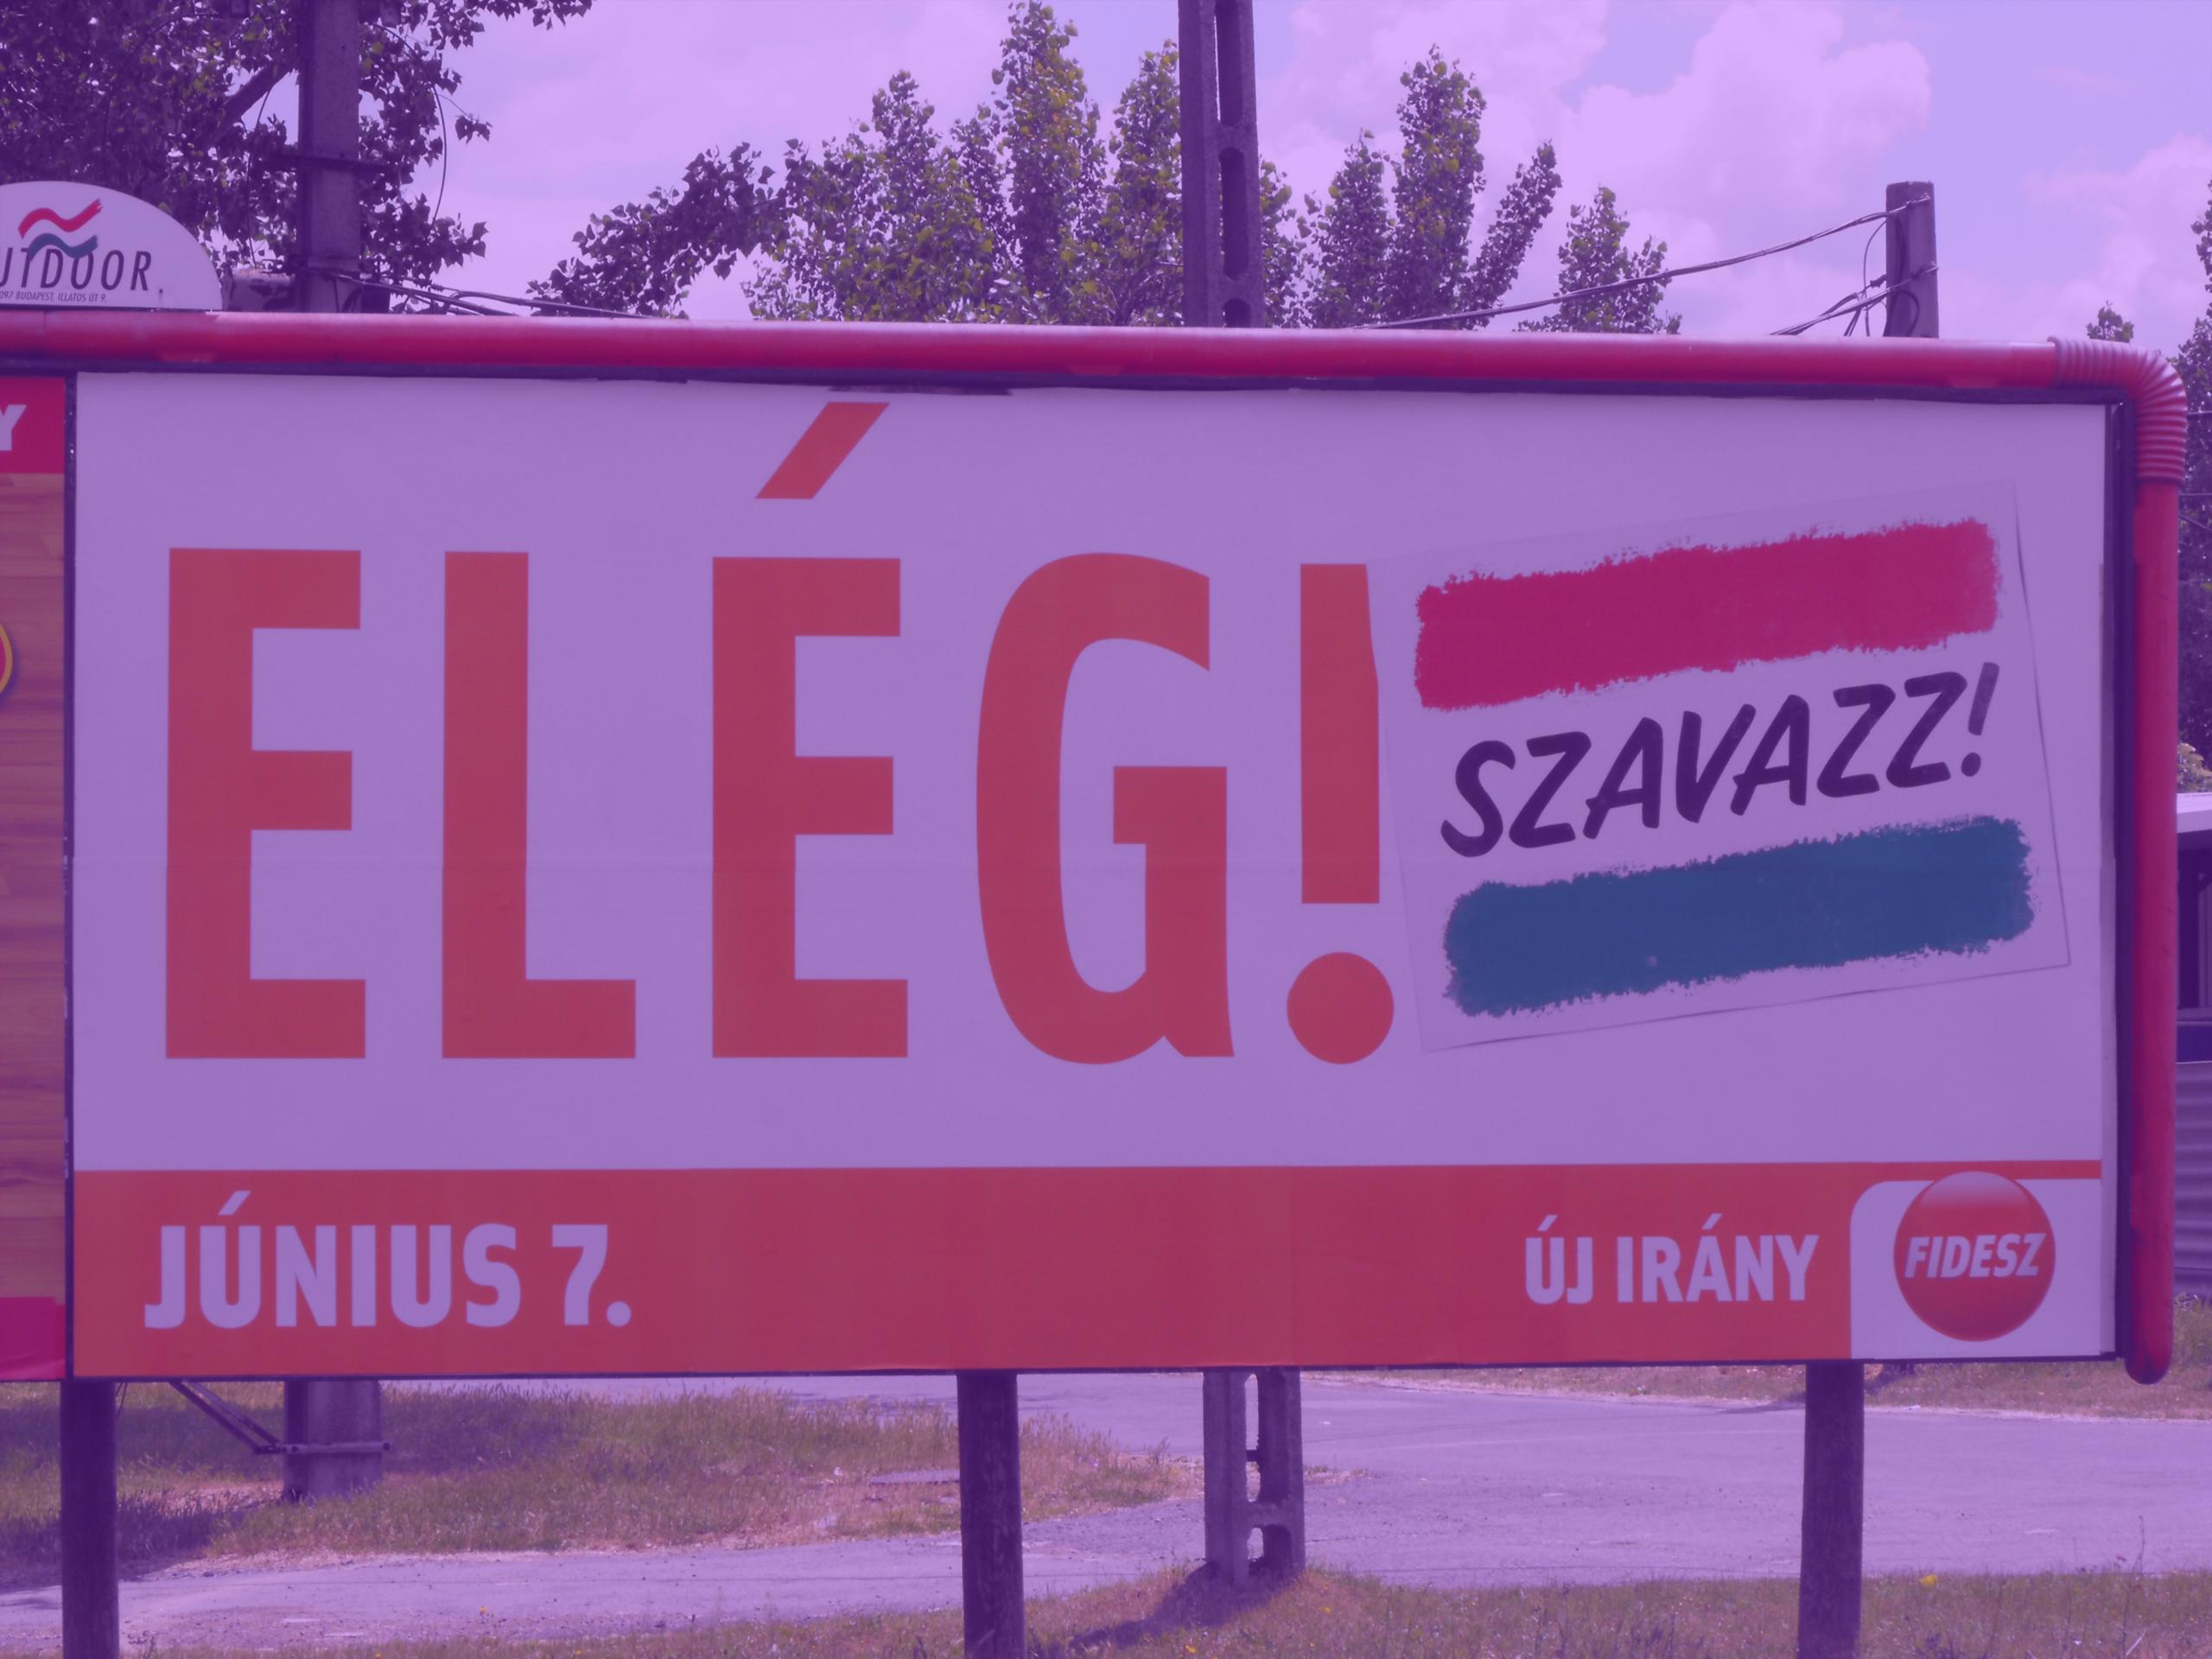 András Bíró-Nagy – Orbán's political jackpot: migration and the Hungarian electorate